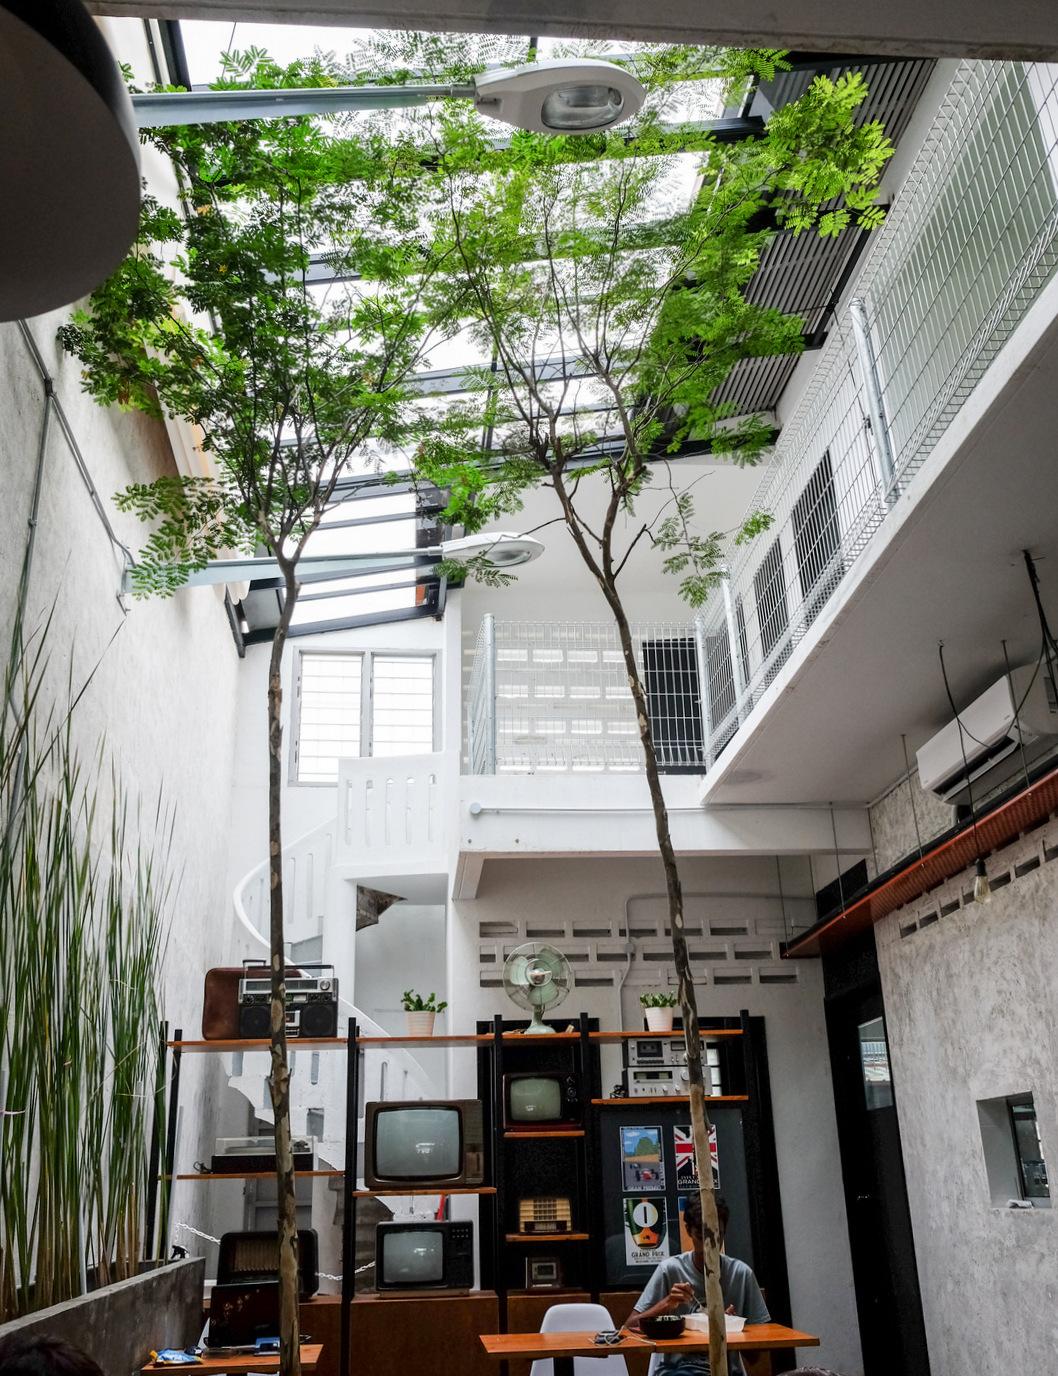 Eat Drink Kl Tujoh Section 17 Petaling Jaya